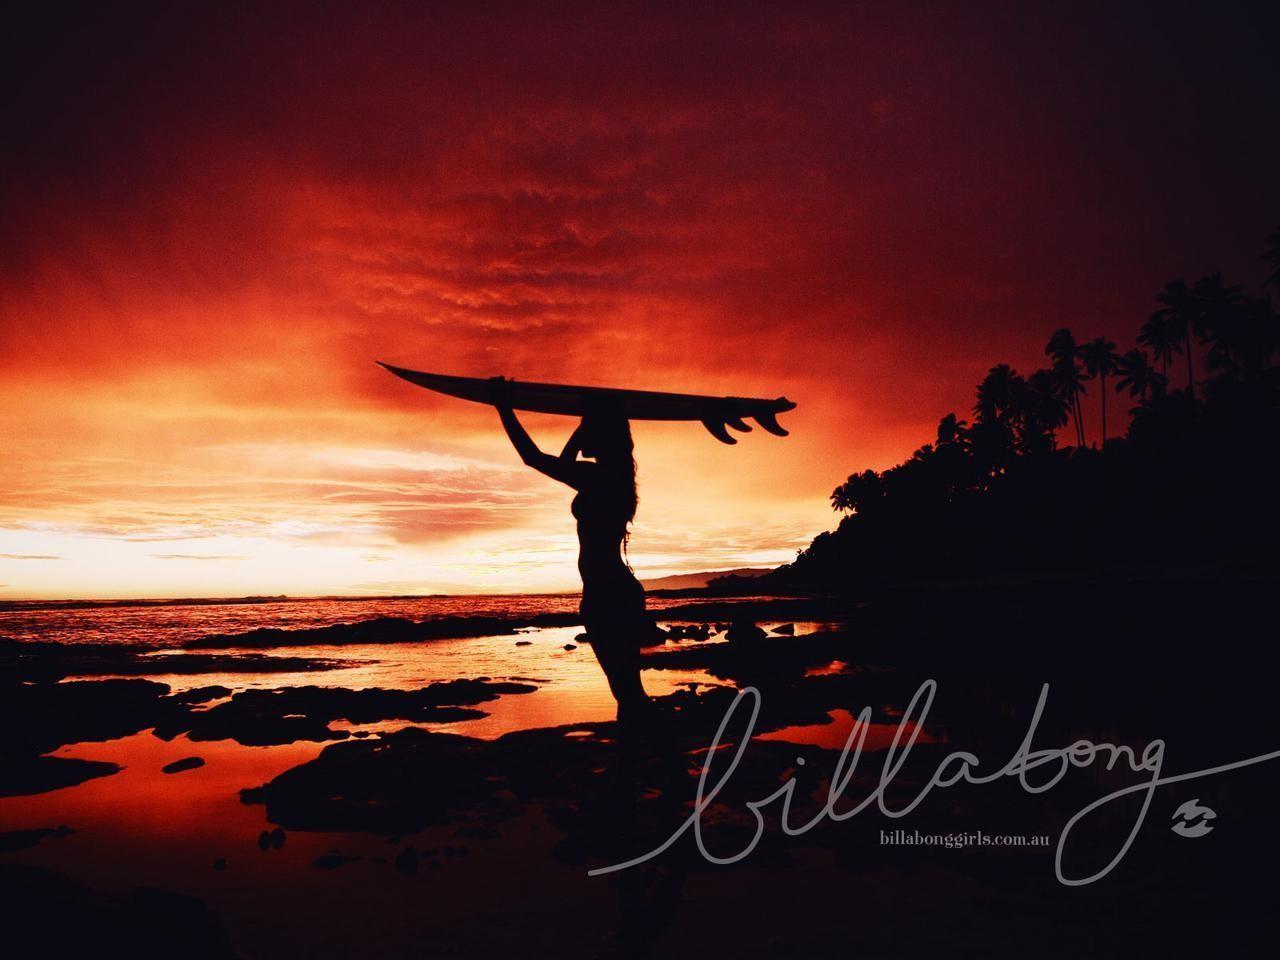 Australia Billabong beaches surfing